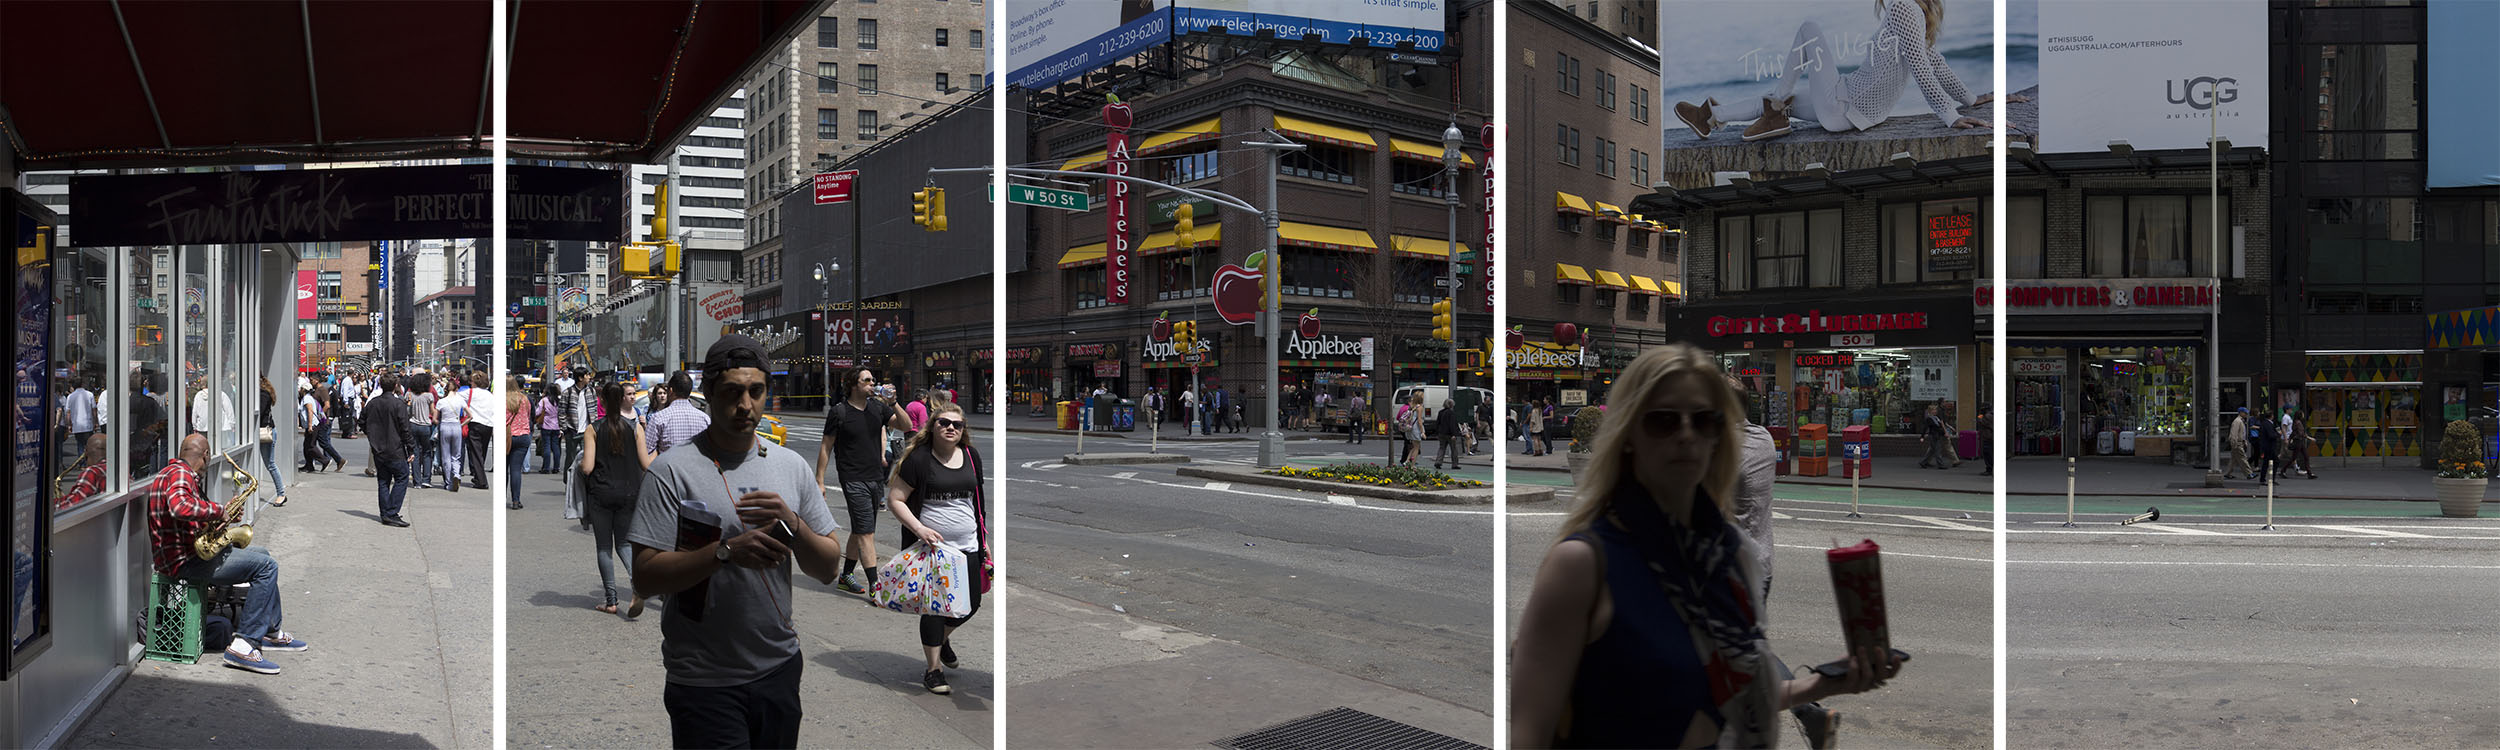 New York, Manhattan,4-18-2015,5926-5954